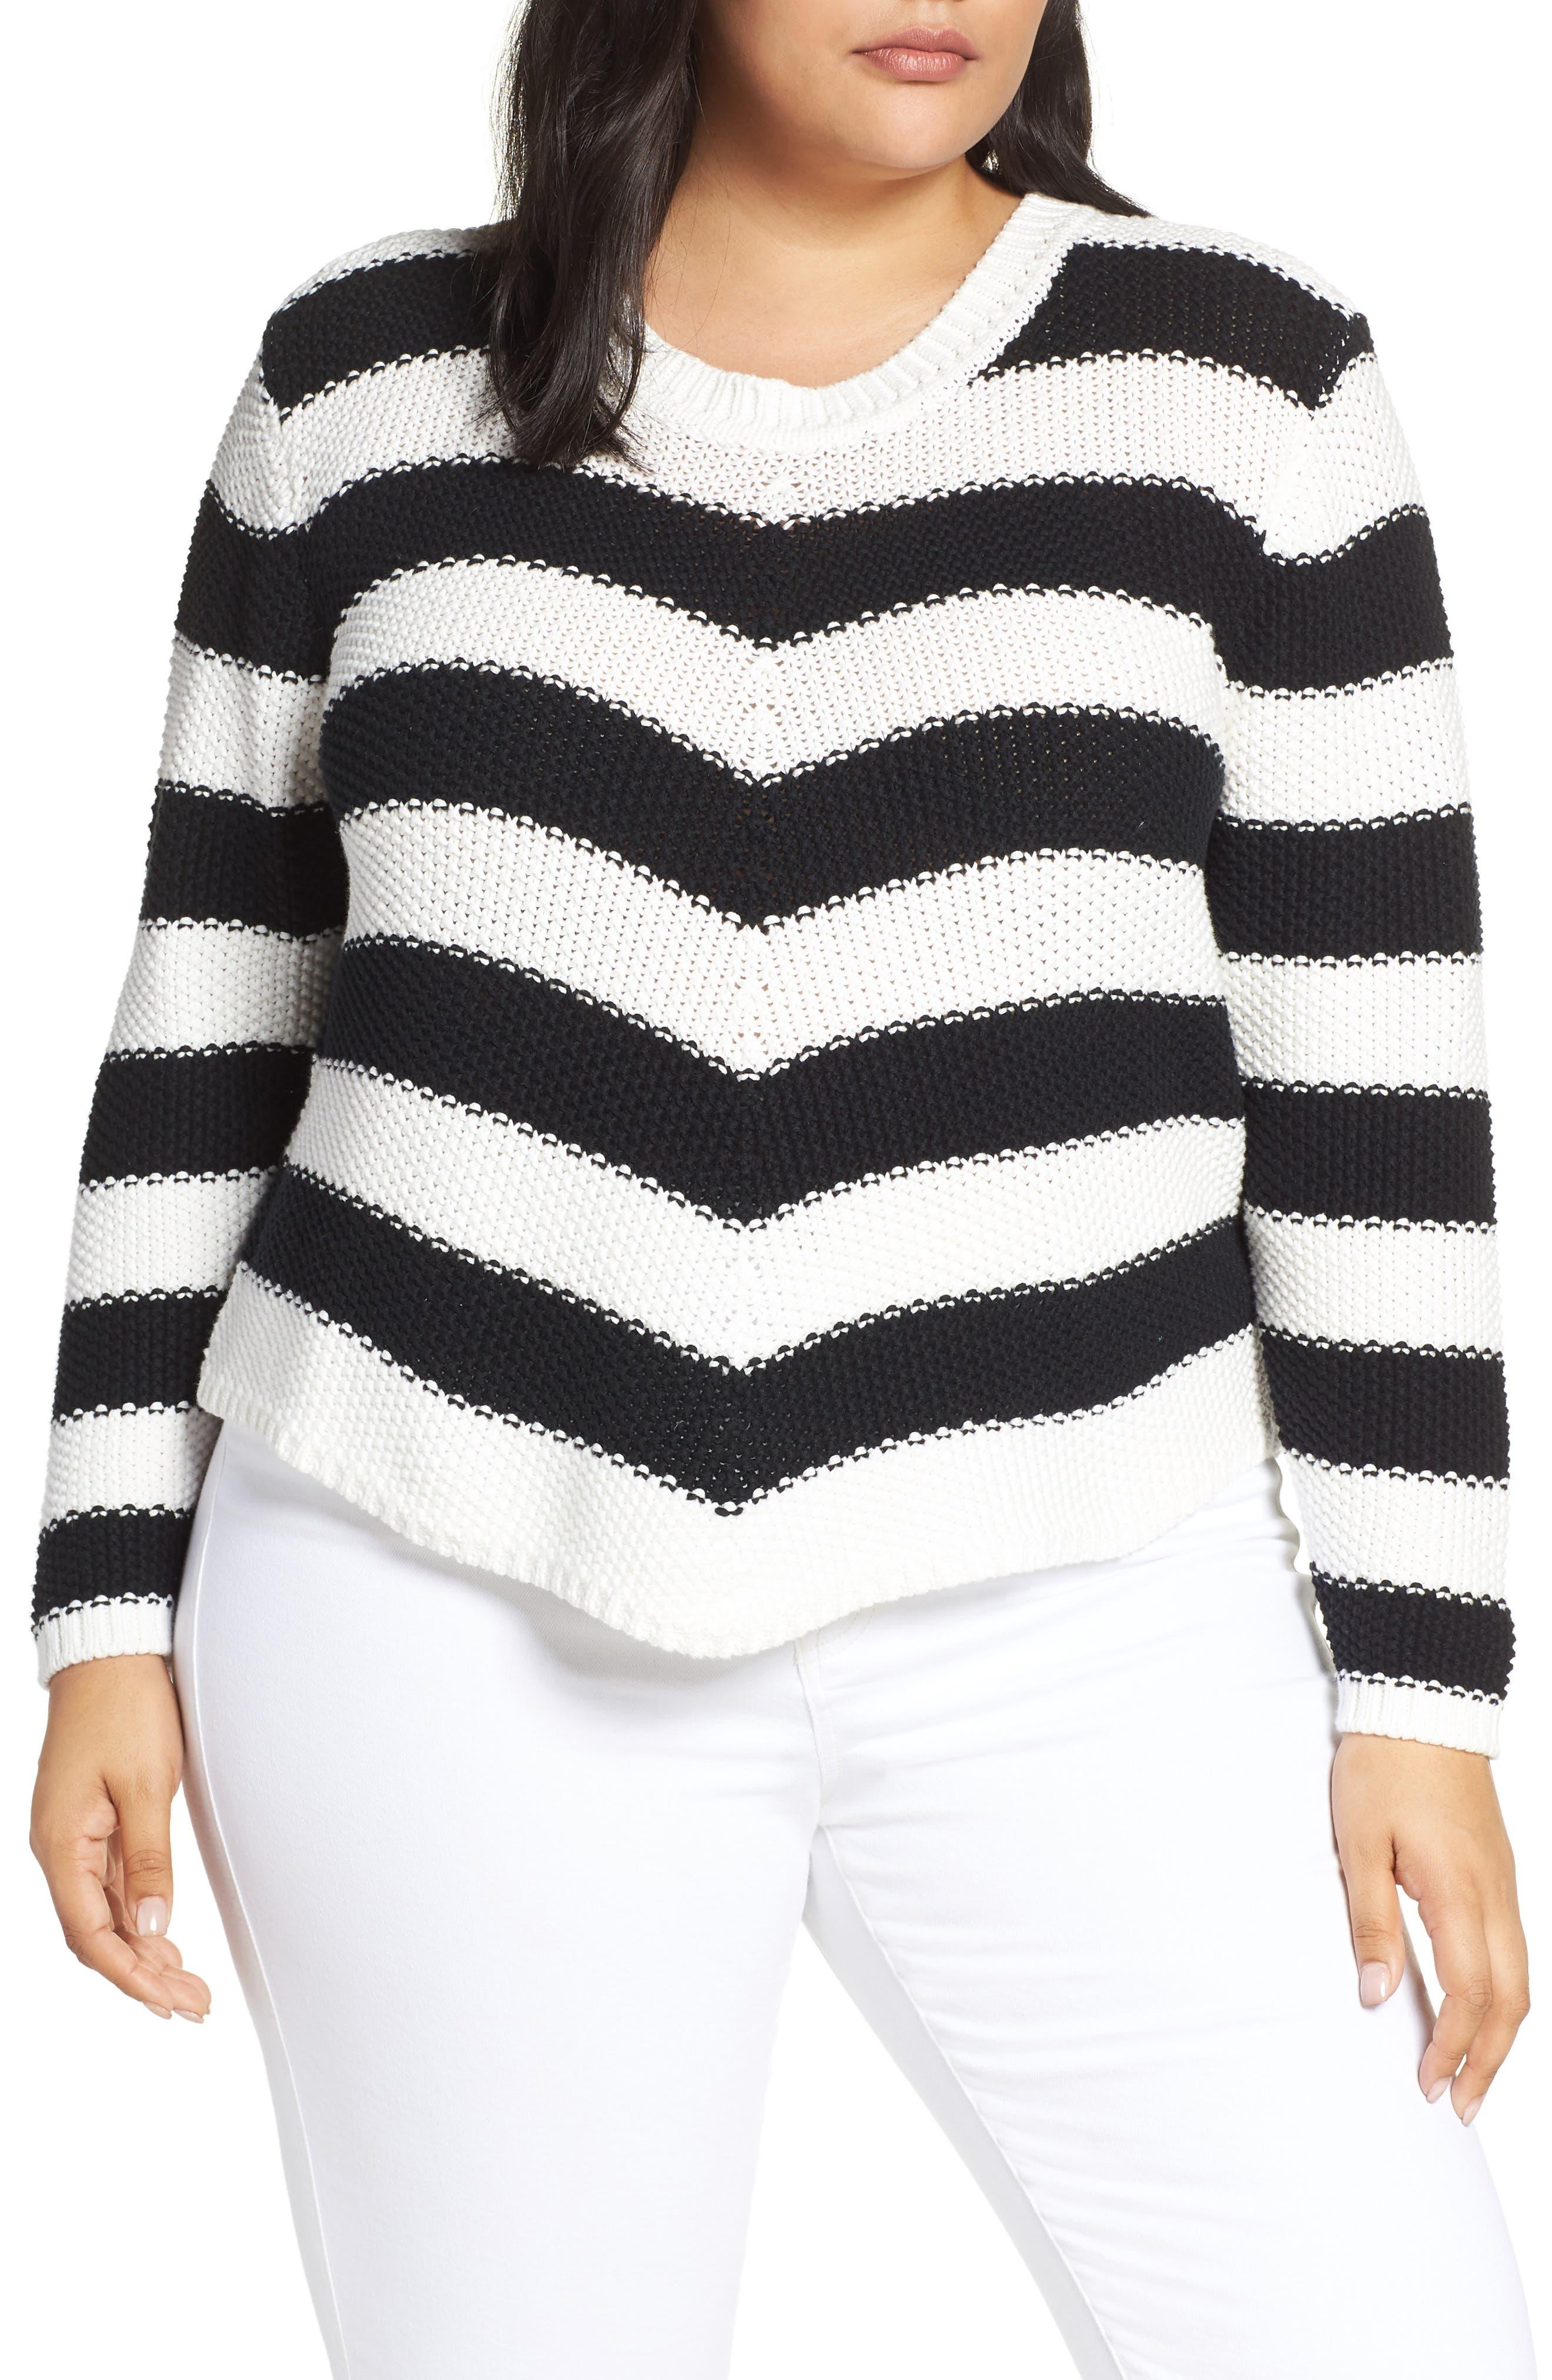 Stitch Stripe Sweater, Main, color, 001